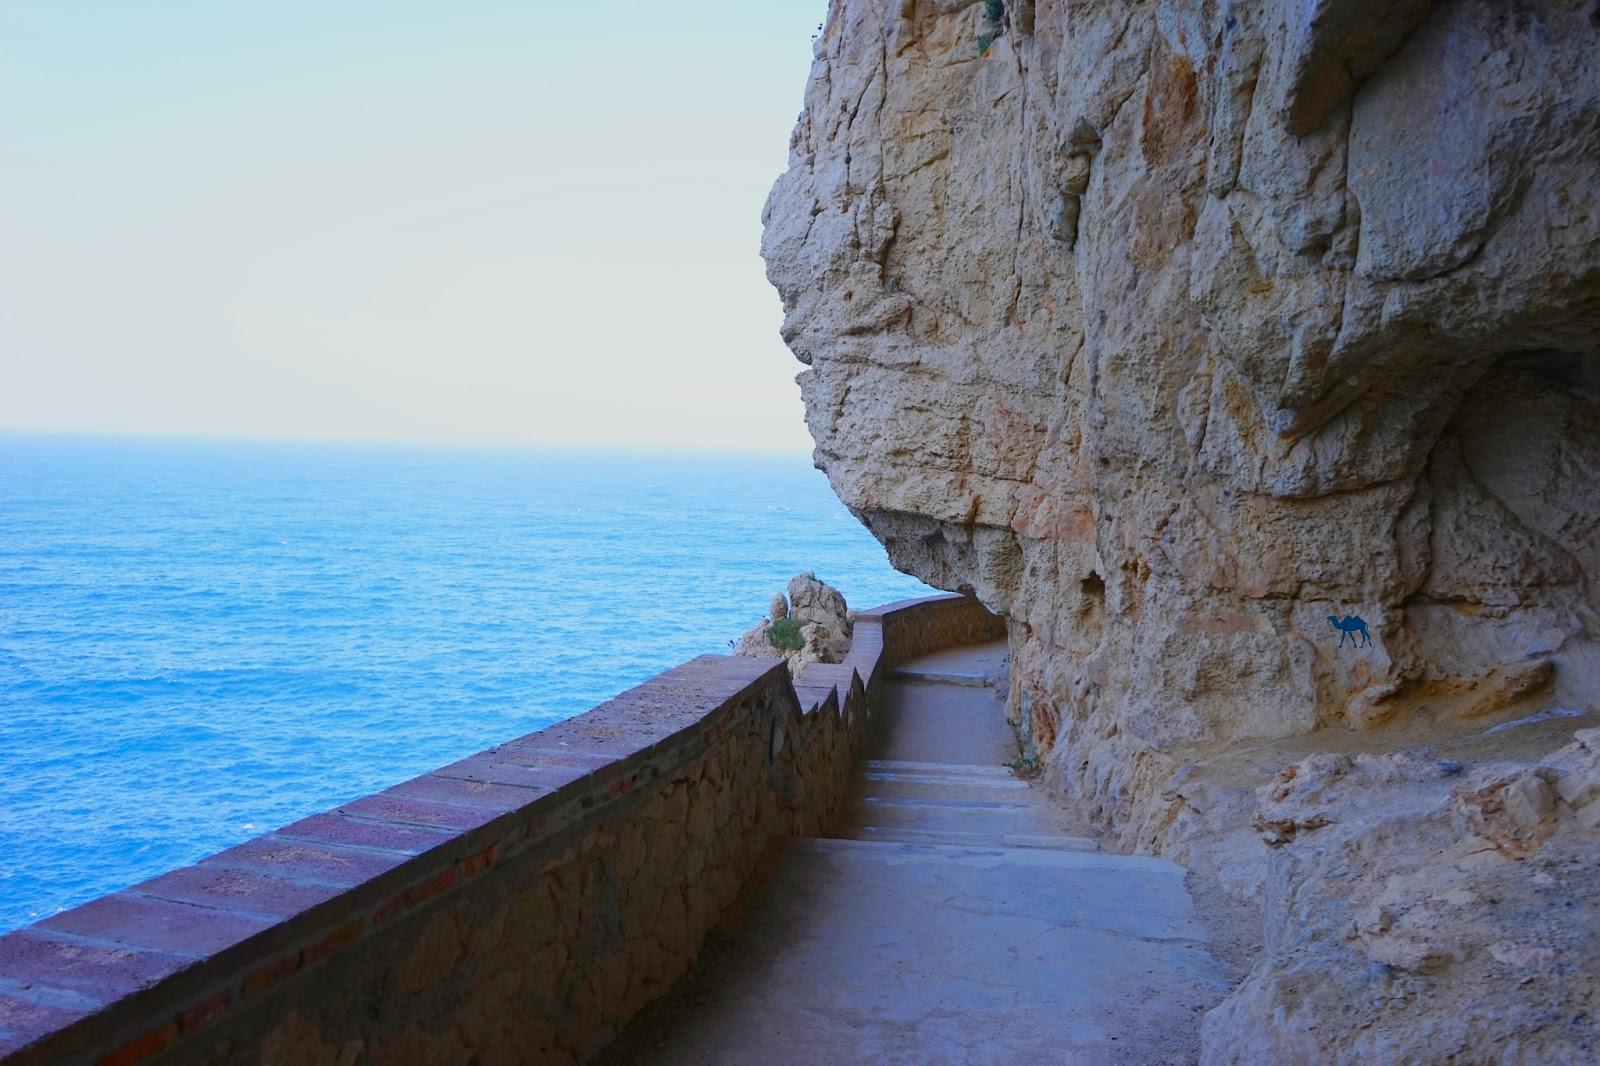 Le Chameau Bleu -Blog Voyage Sardaigne - L'acces a la grotte de Neptune grotto di Nettuno Sardaigne